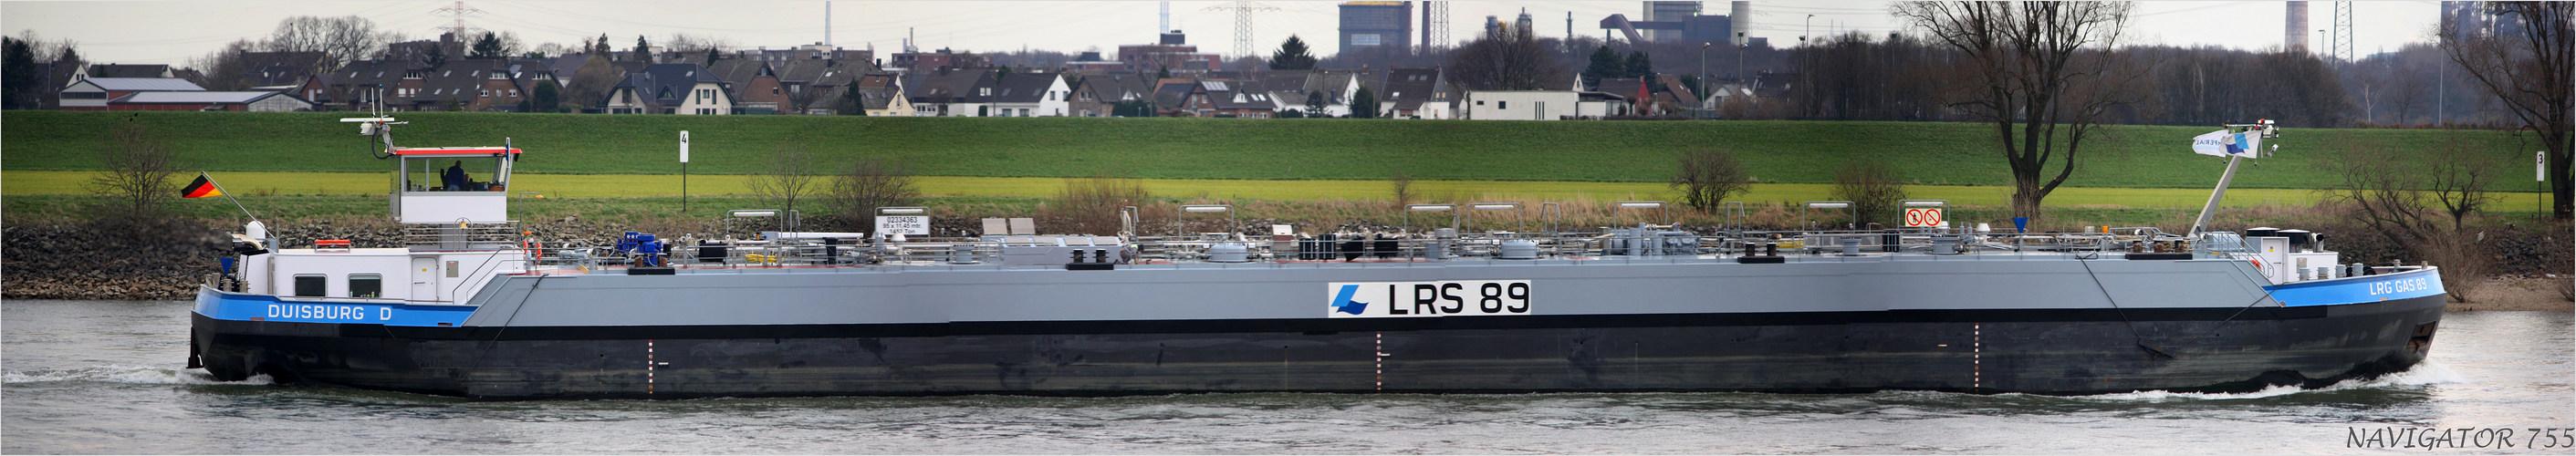 LRG GAS 8/Bitte scrollen!